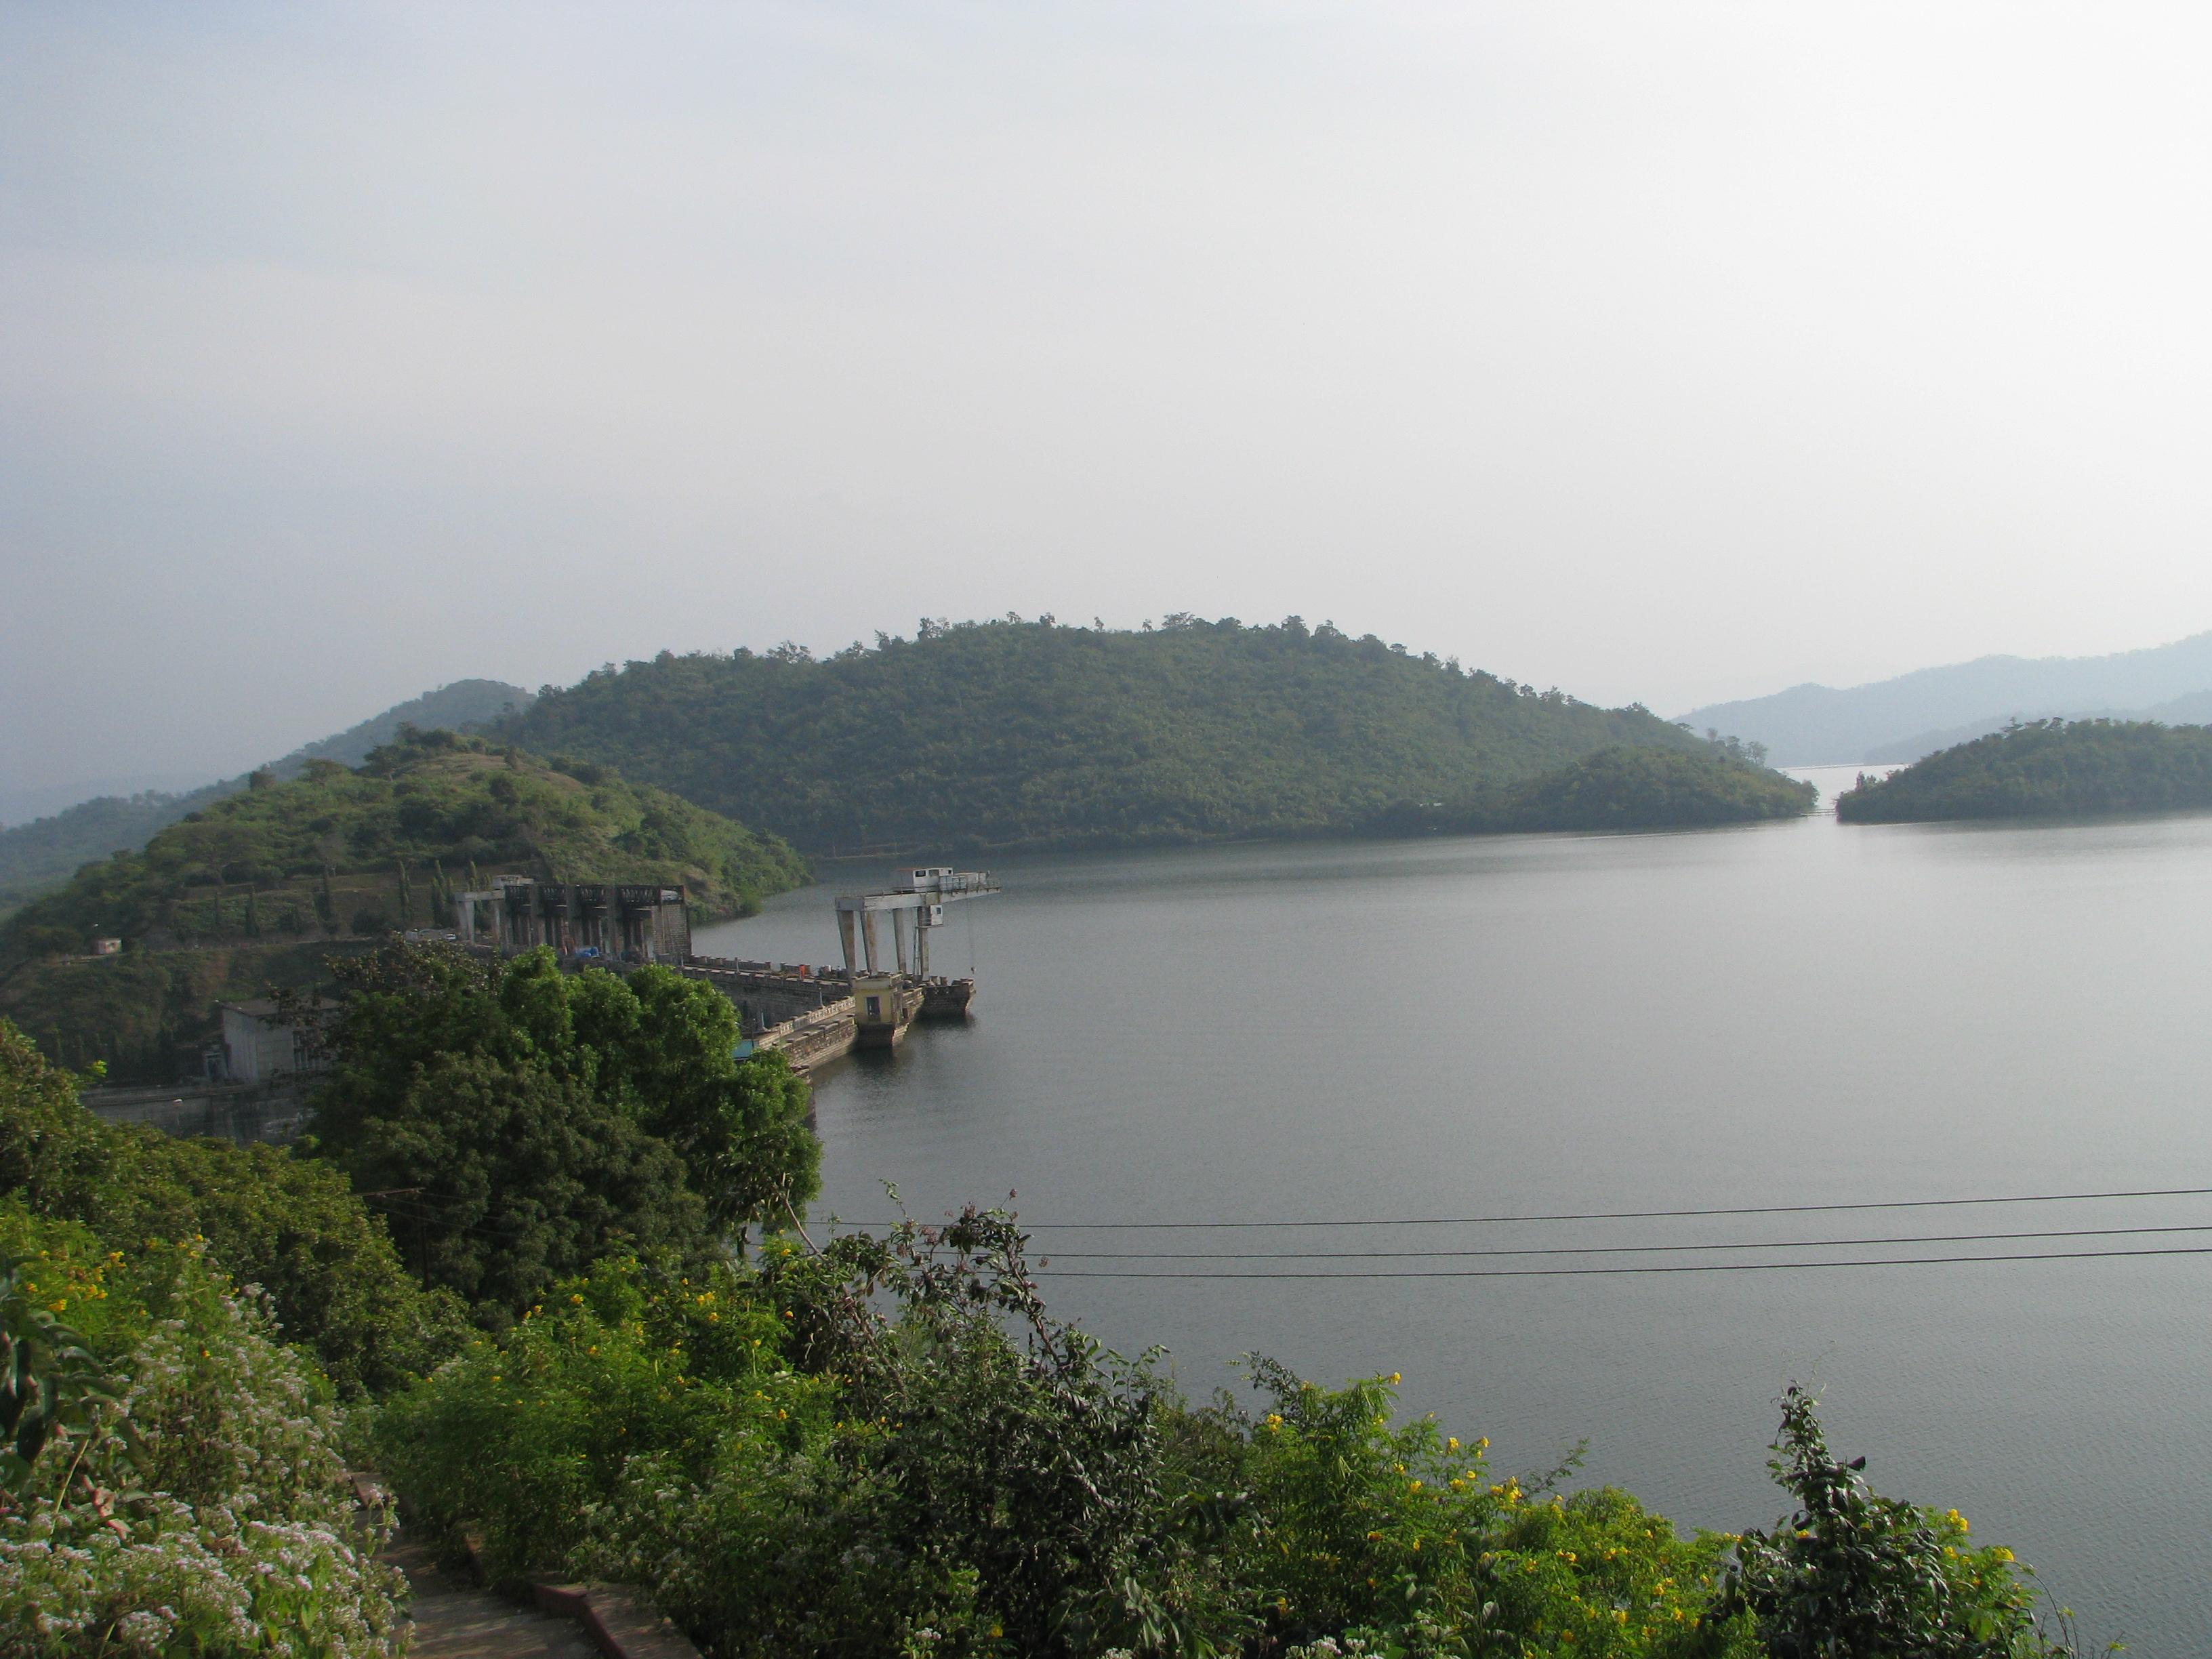 Amruthapura sompura bhadra dam day 1 a proud skoda fabia owner